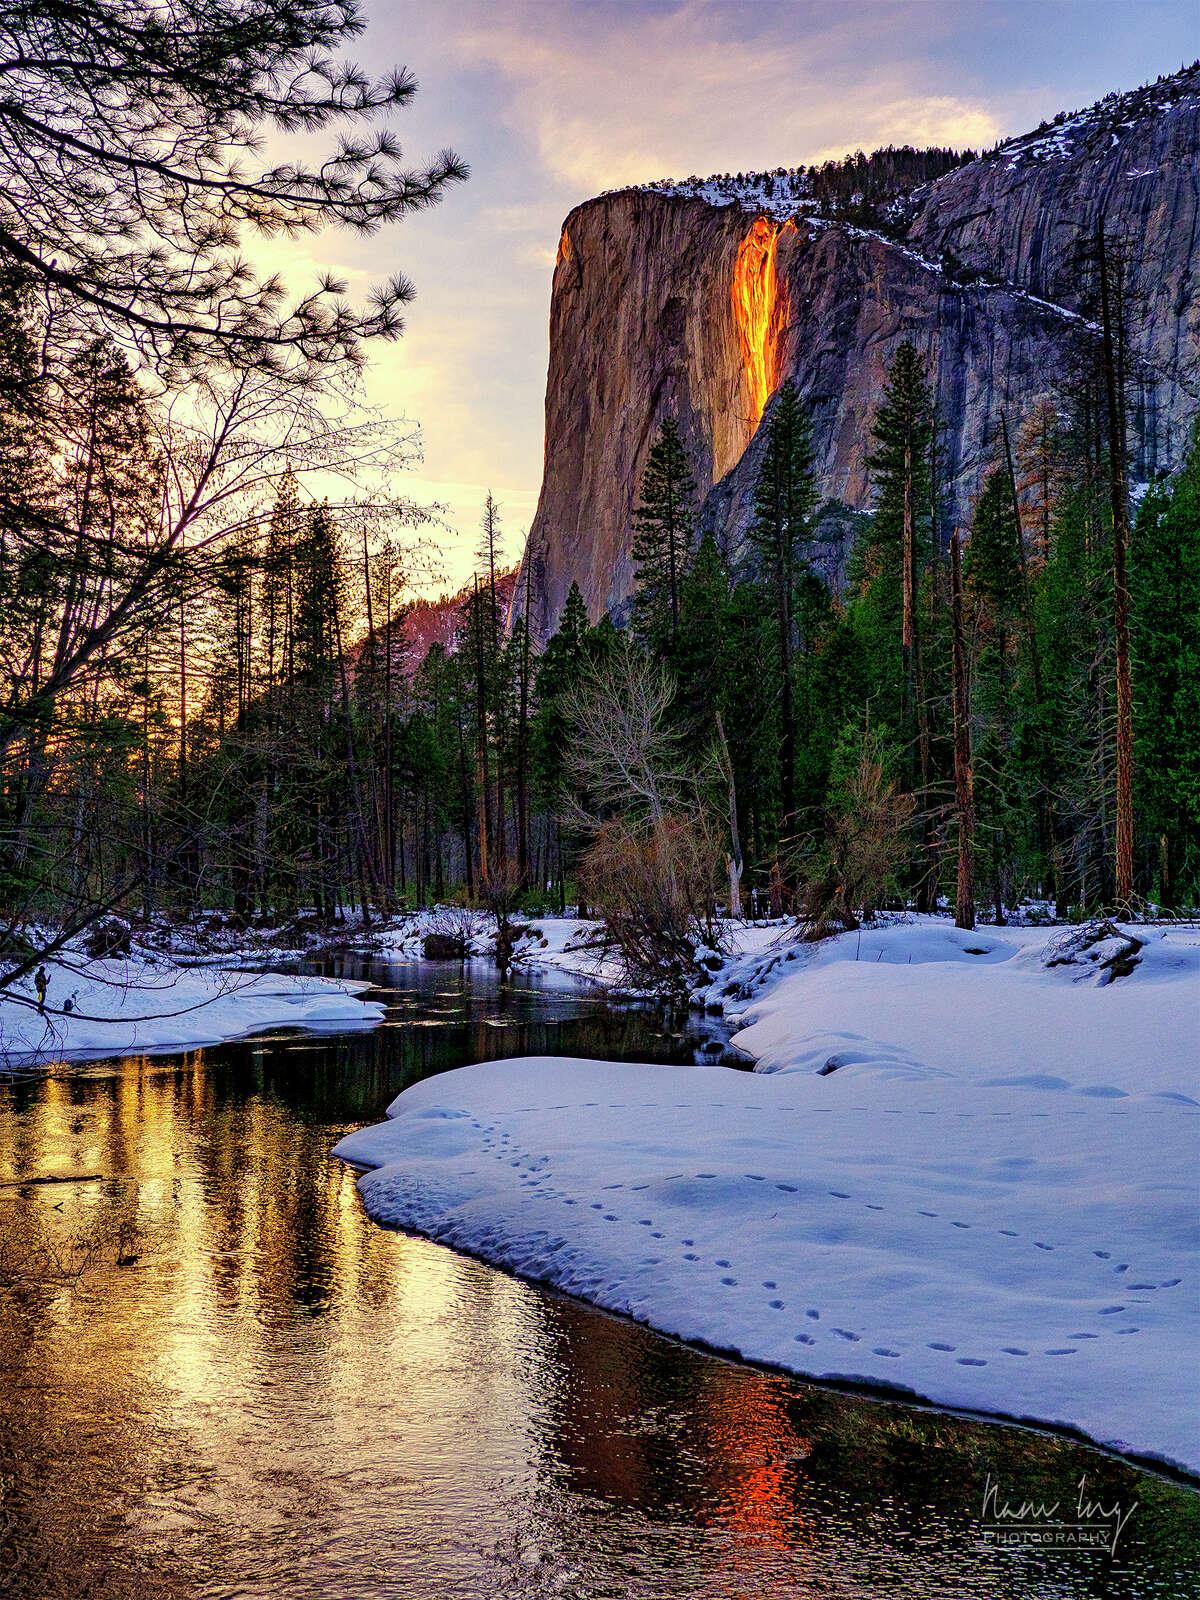 Yosemite's firefall, captured on Feb. 7, 2021.